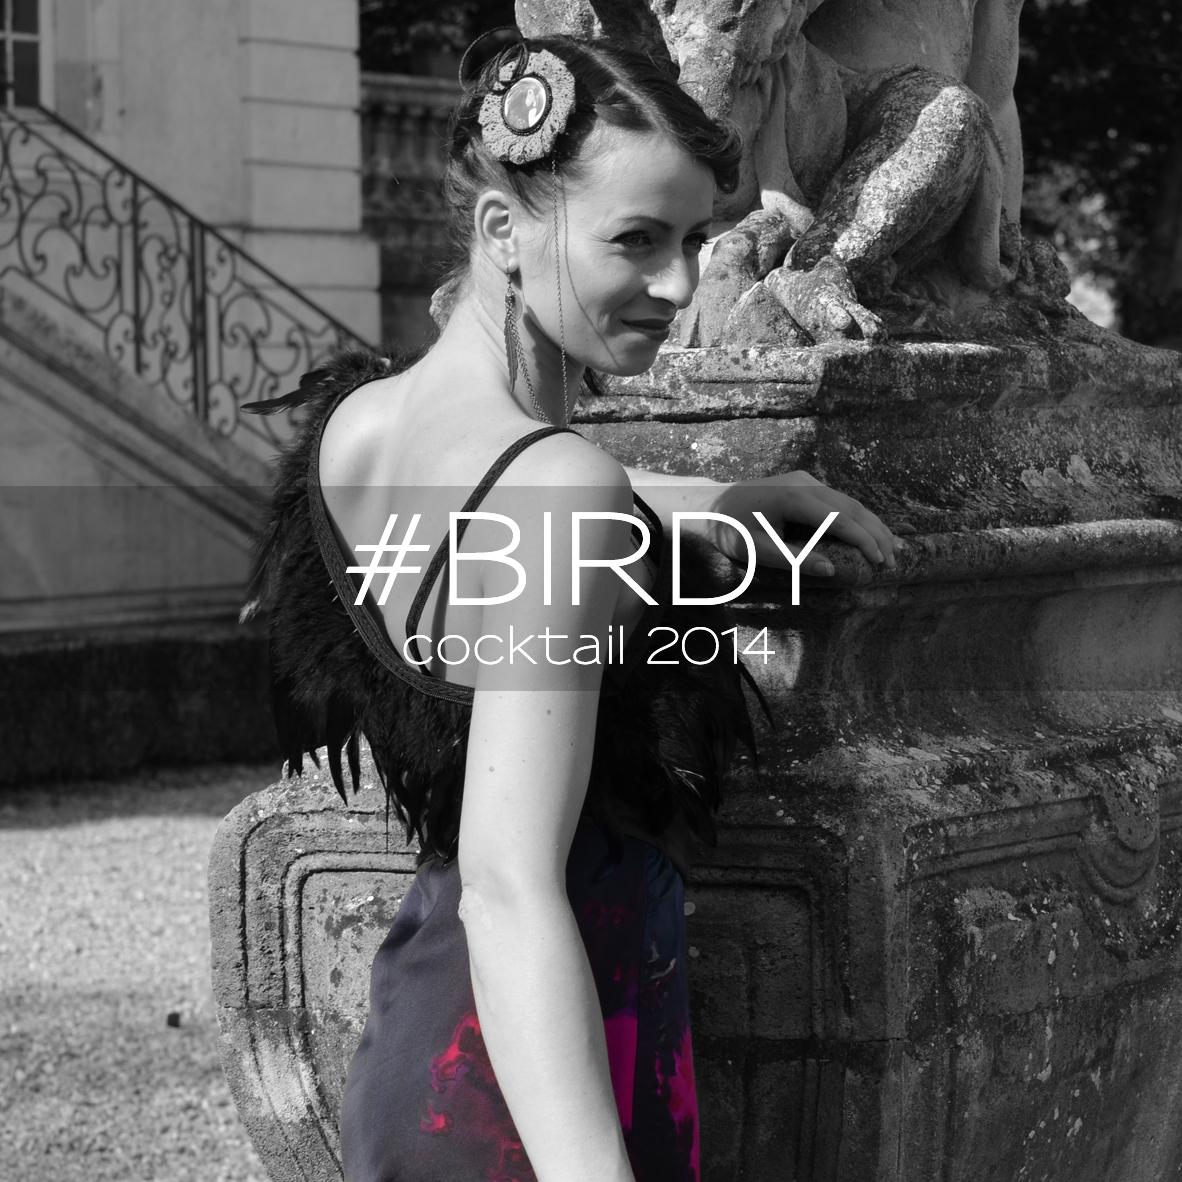 BIRDY cocktail 2014 - Fabienne Dimanov Paris